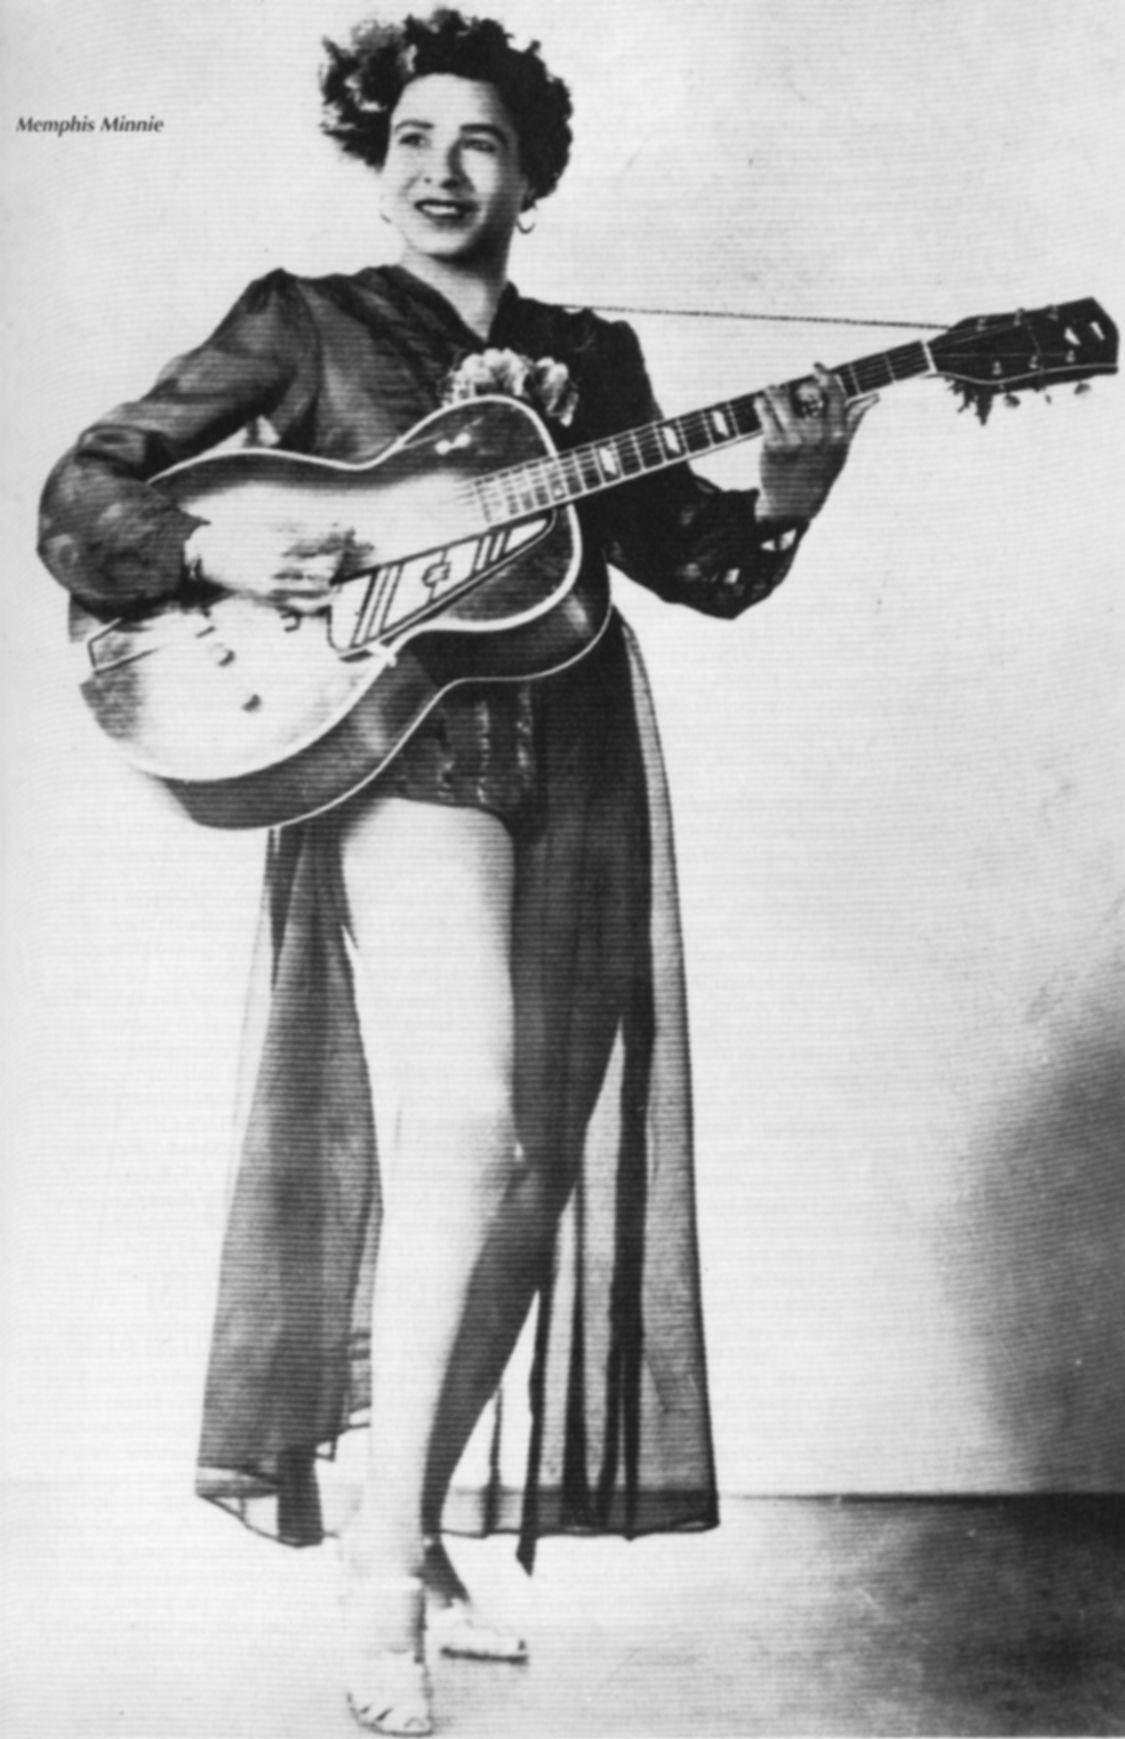 Memphis Minnie  Blueswoman Recording career 1920' to 1950